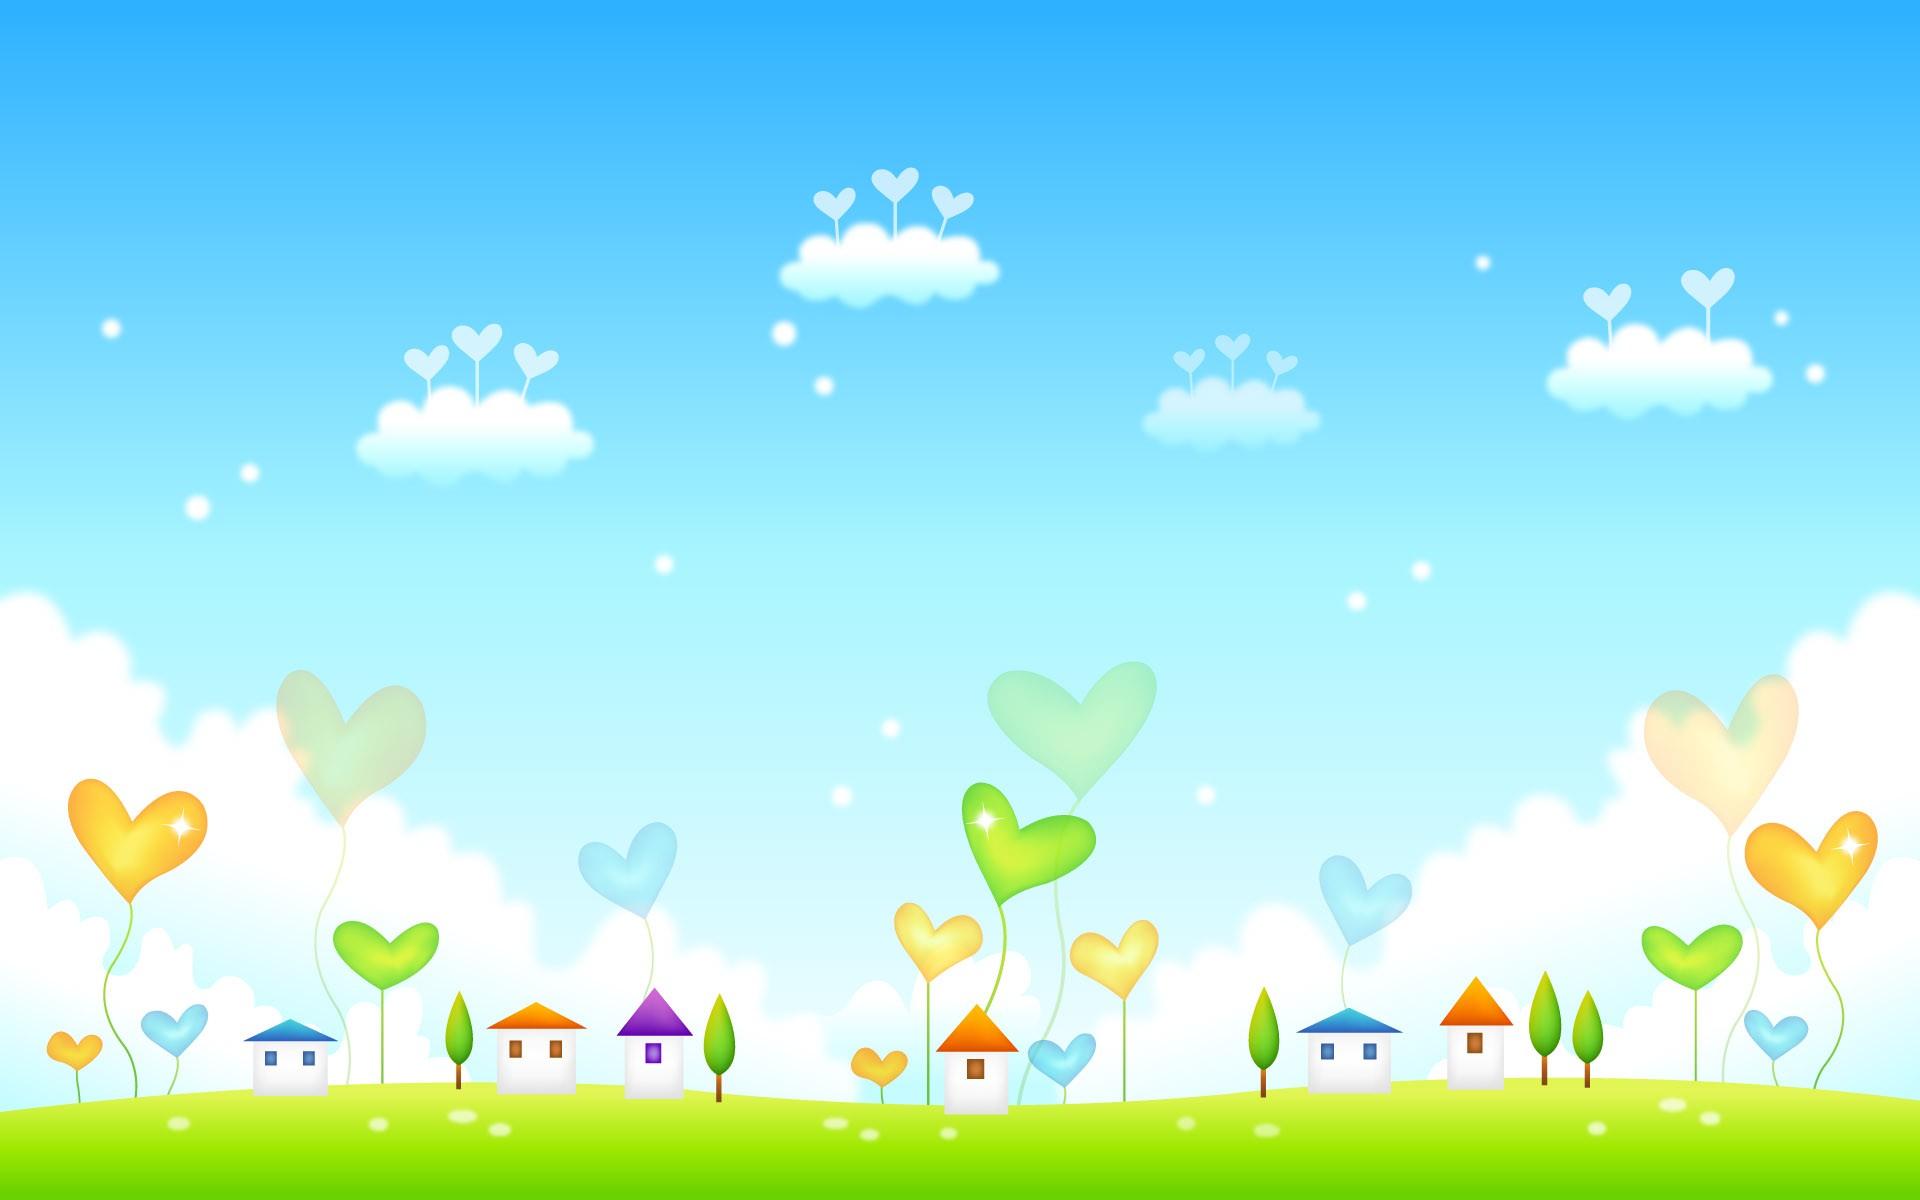 Fondos para niños hd 1920x1200 - imagenes - wallpapers gratis ...